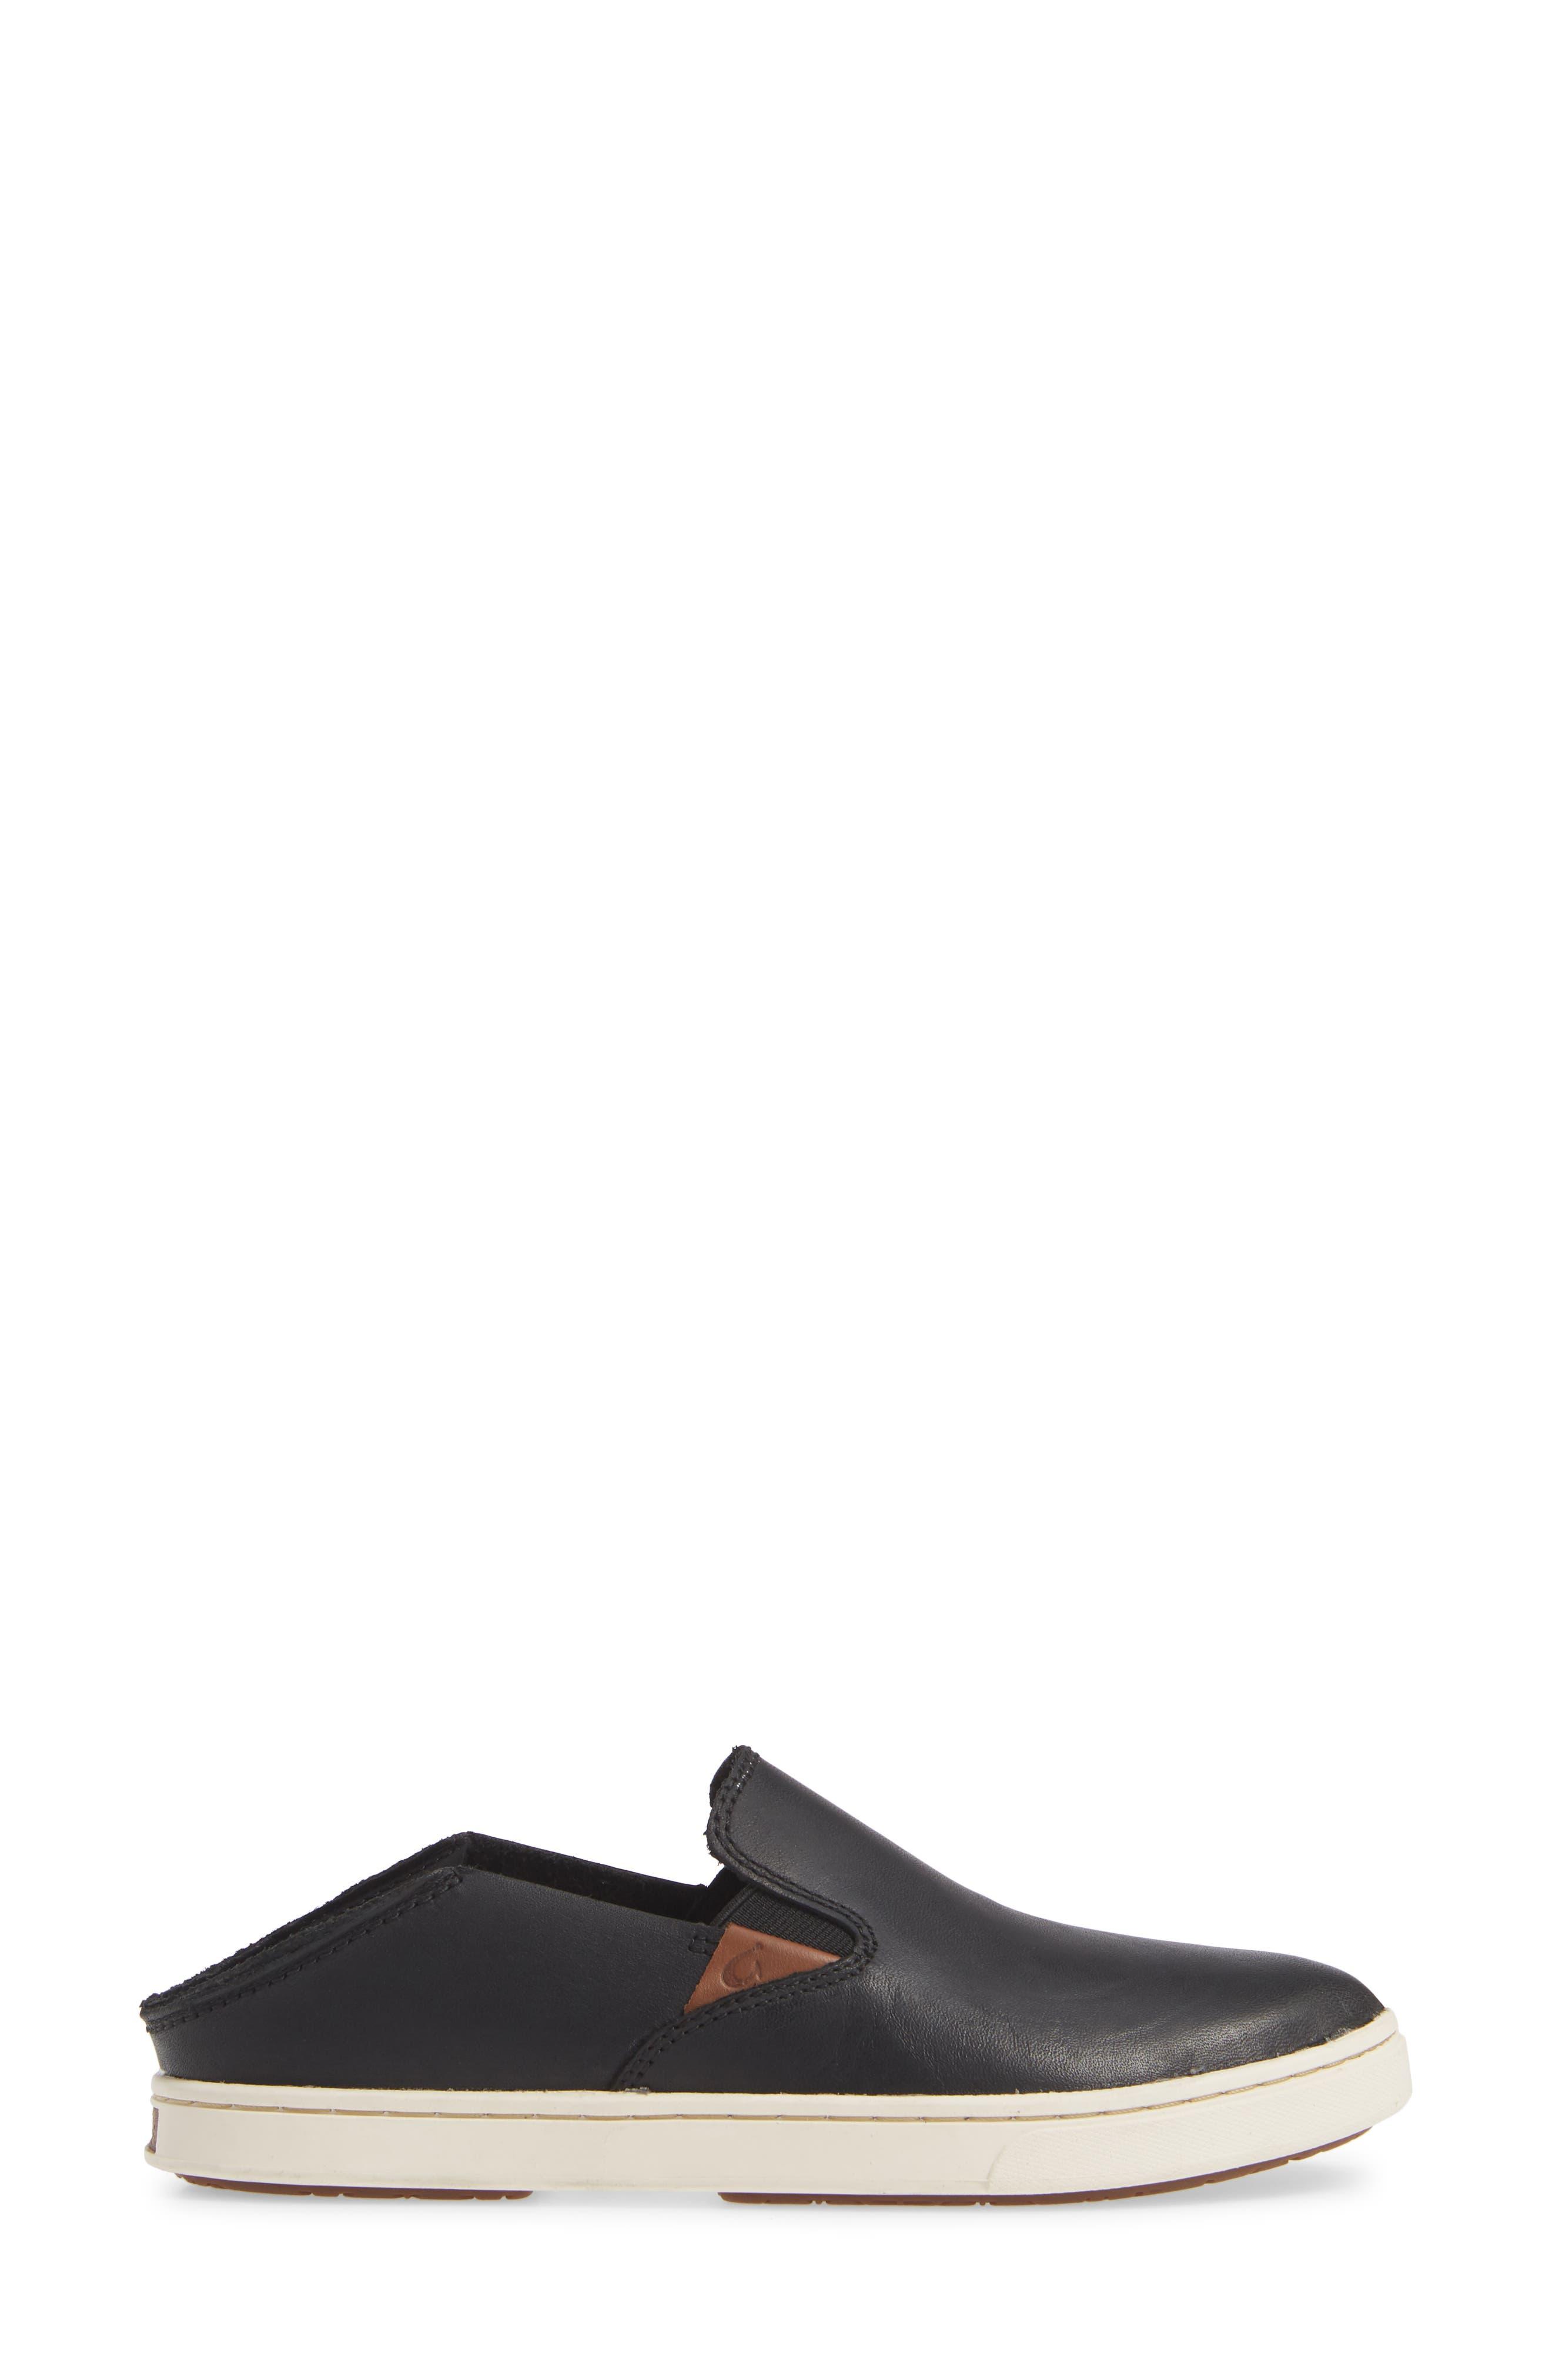 Pehuea Slip-On Sneaker,                             Alternate thumbnail 4, color,                             BLACK/ BLACK LEATHER